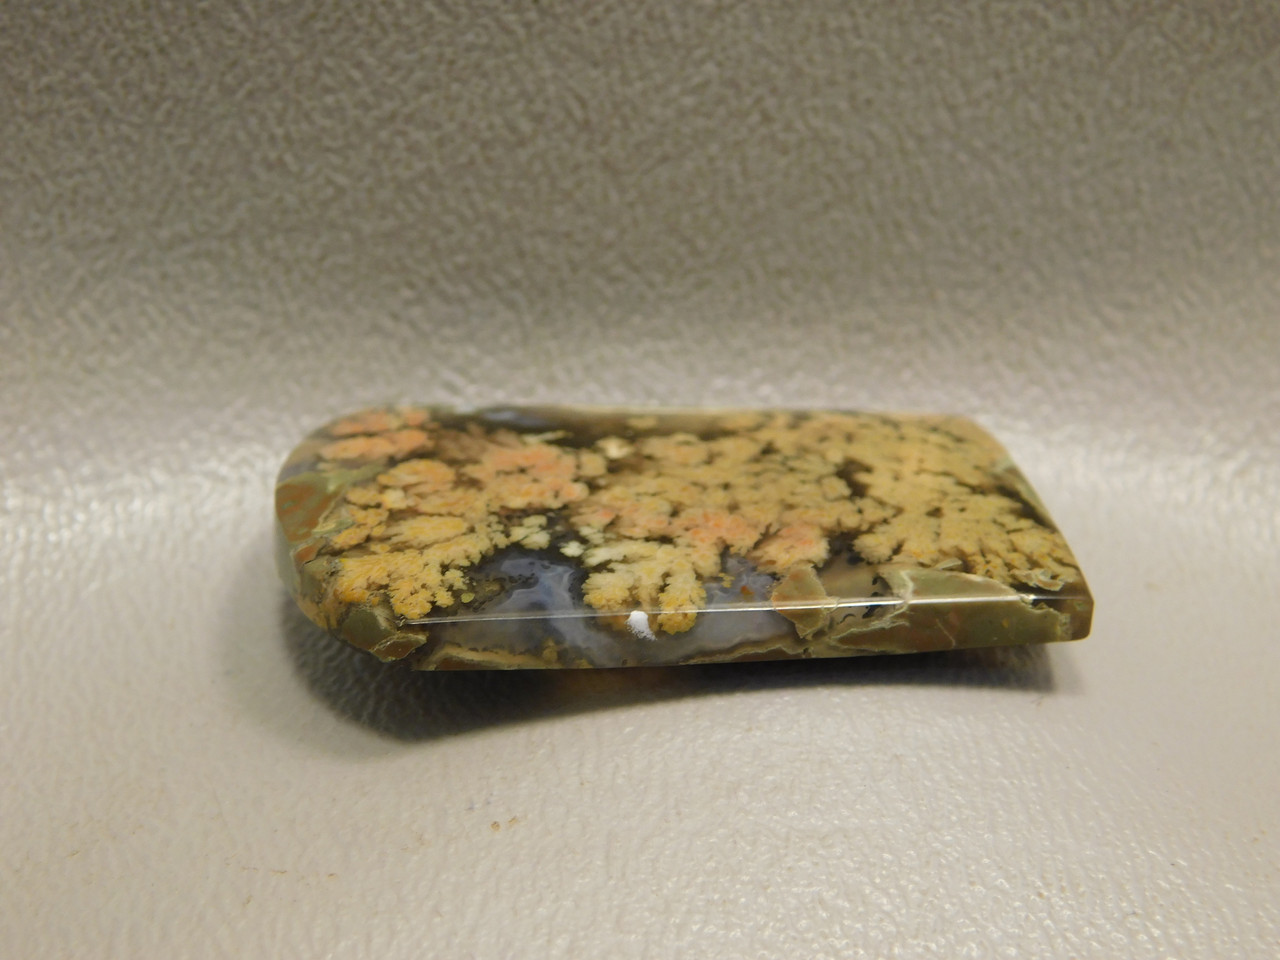 Designer Cabochon Rare Tongue Shaped Priday Plume Agate Oregon #5